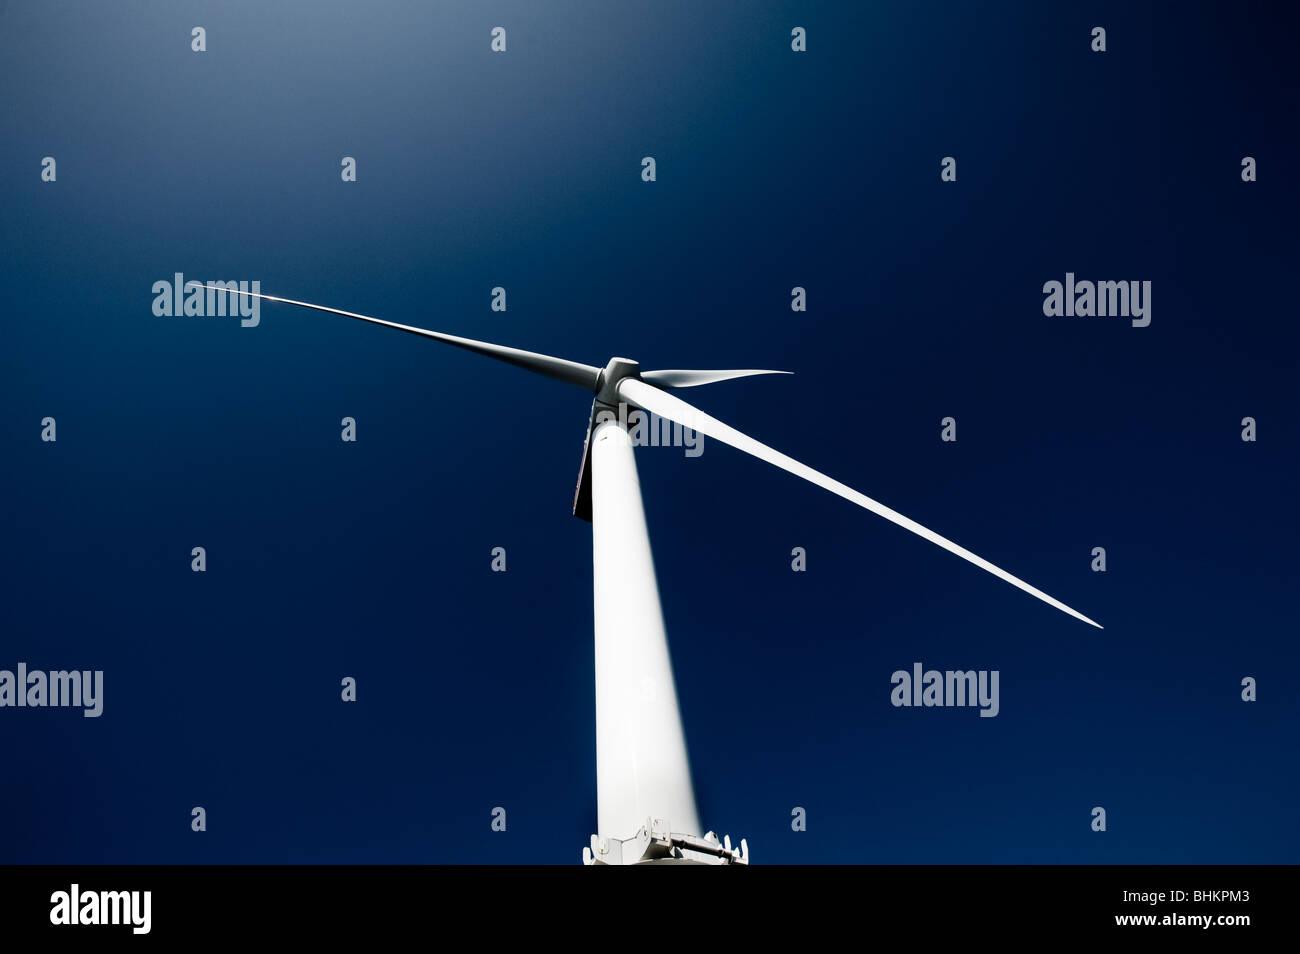 Bild der Offshore-Windturbine gegen blauen Himmel Stockbild